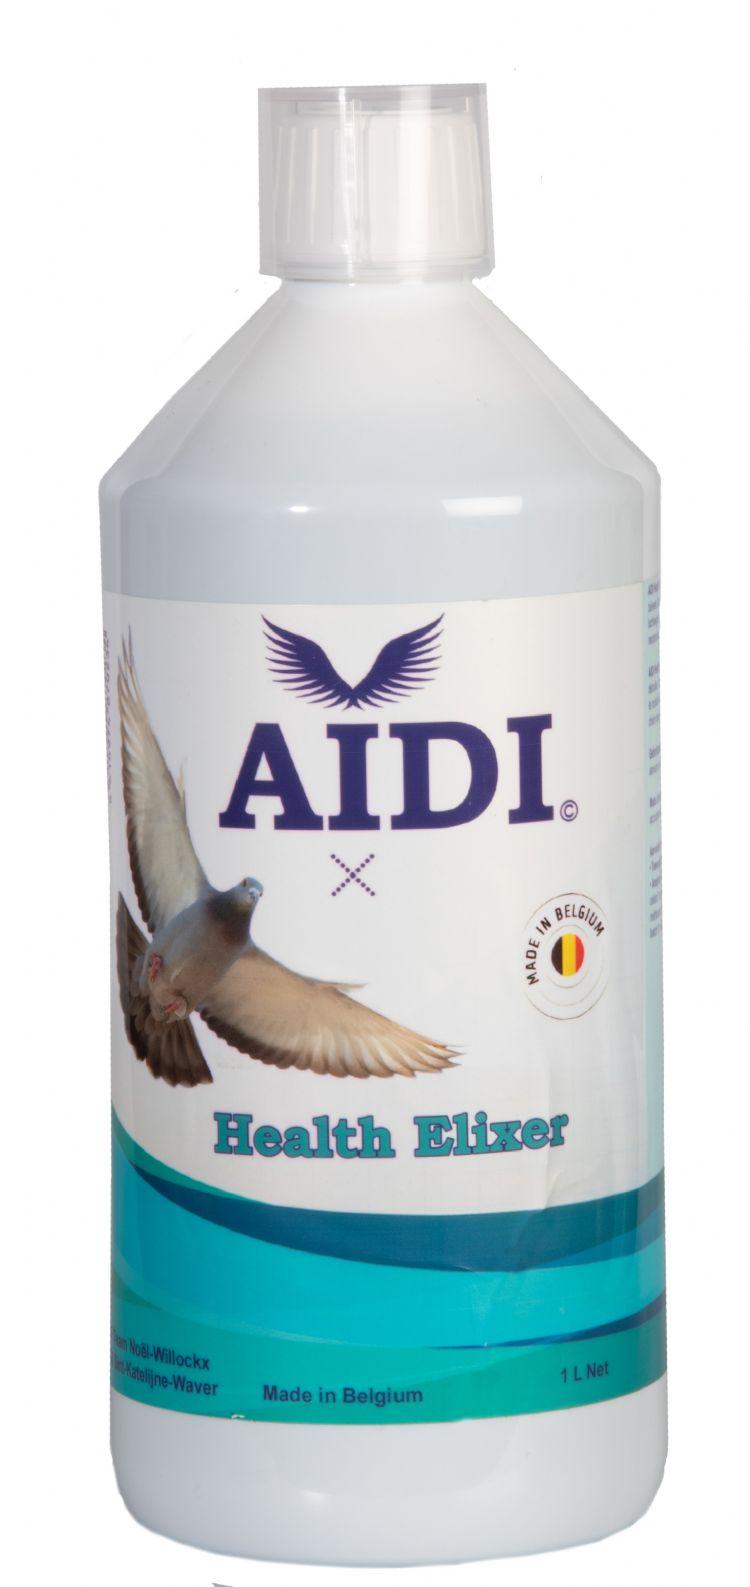 AIDI Health Elixir